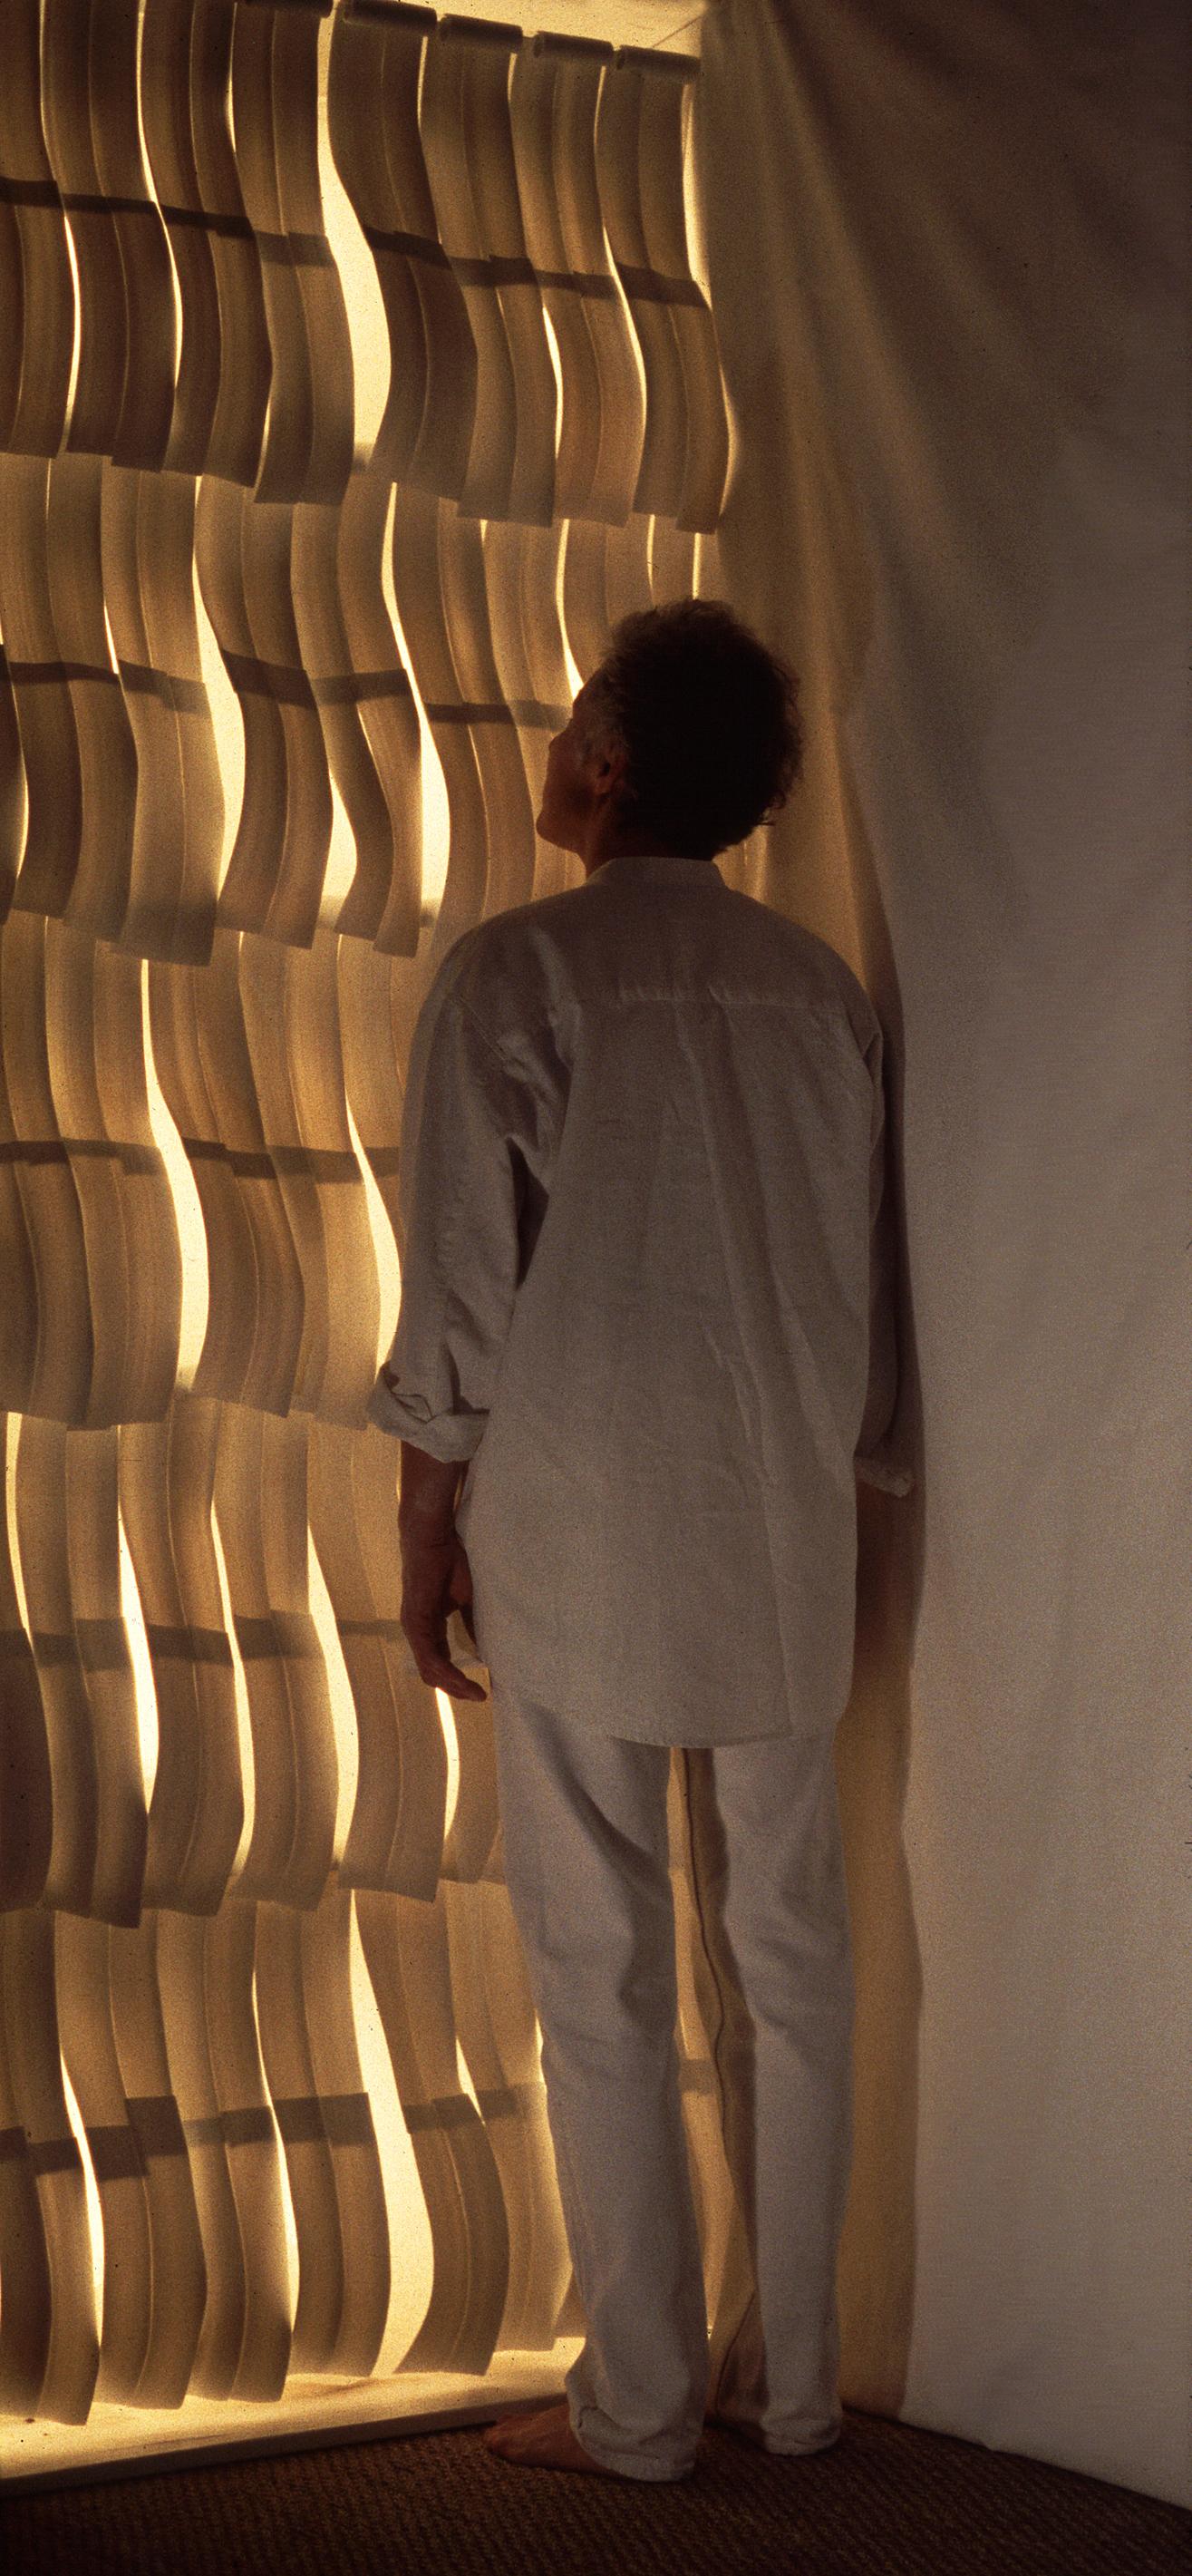 36. Porcelain Curtain